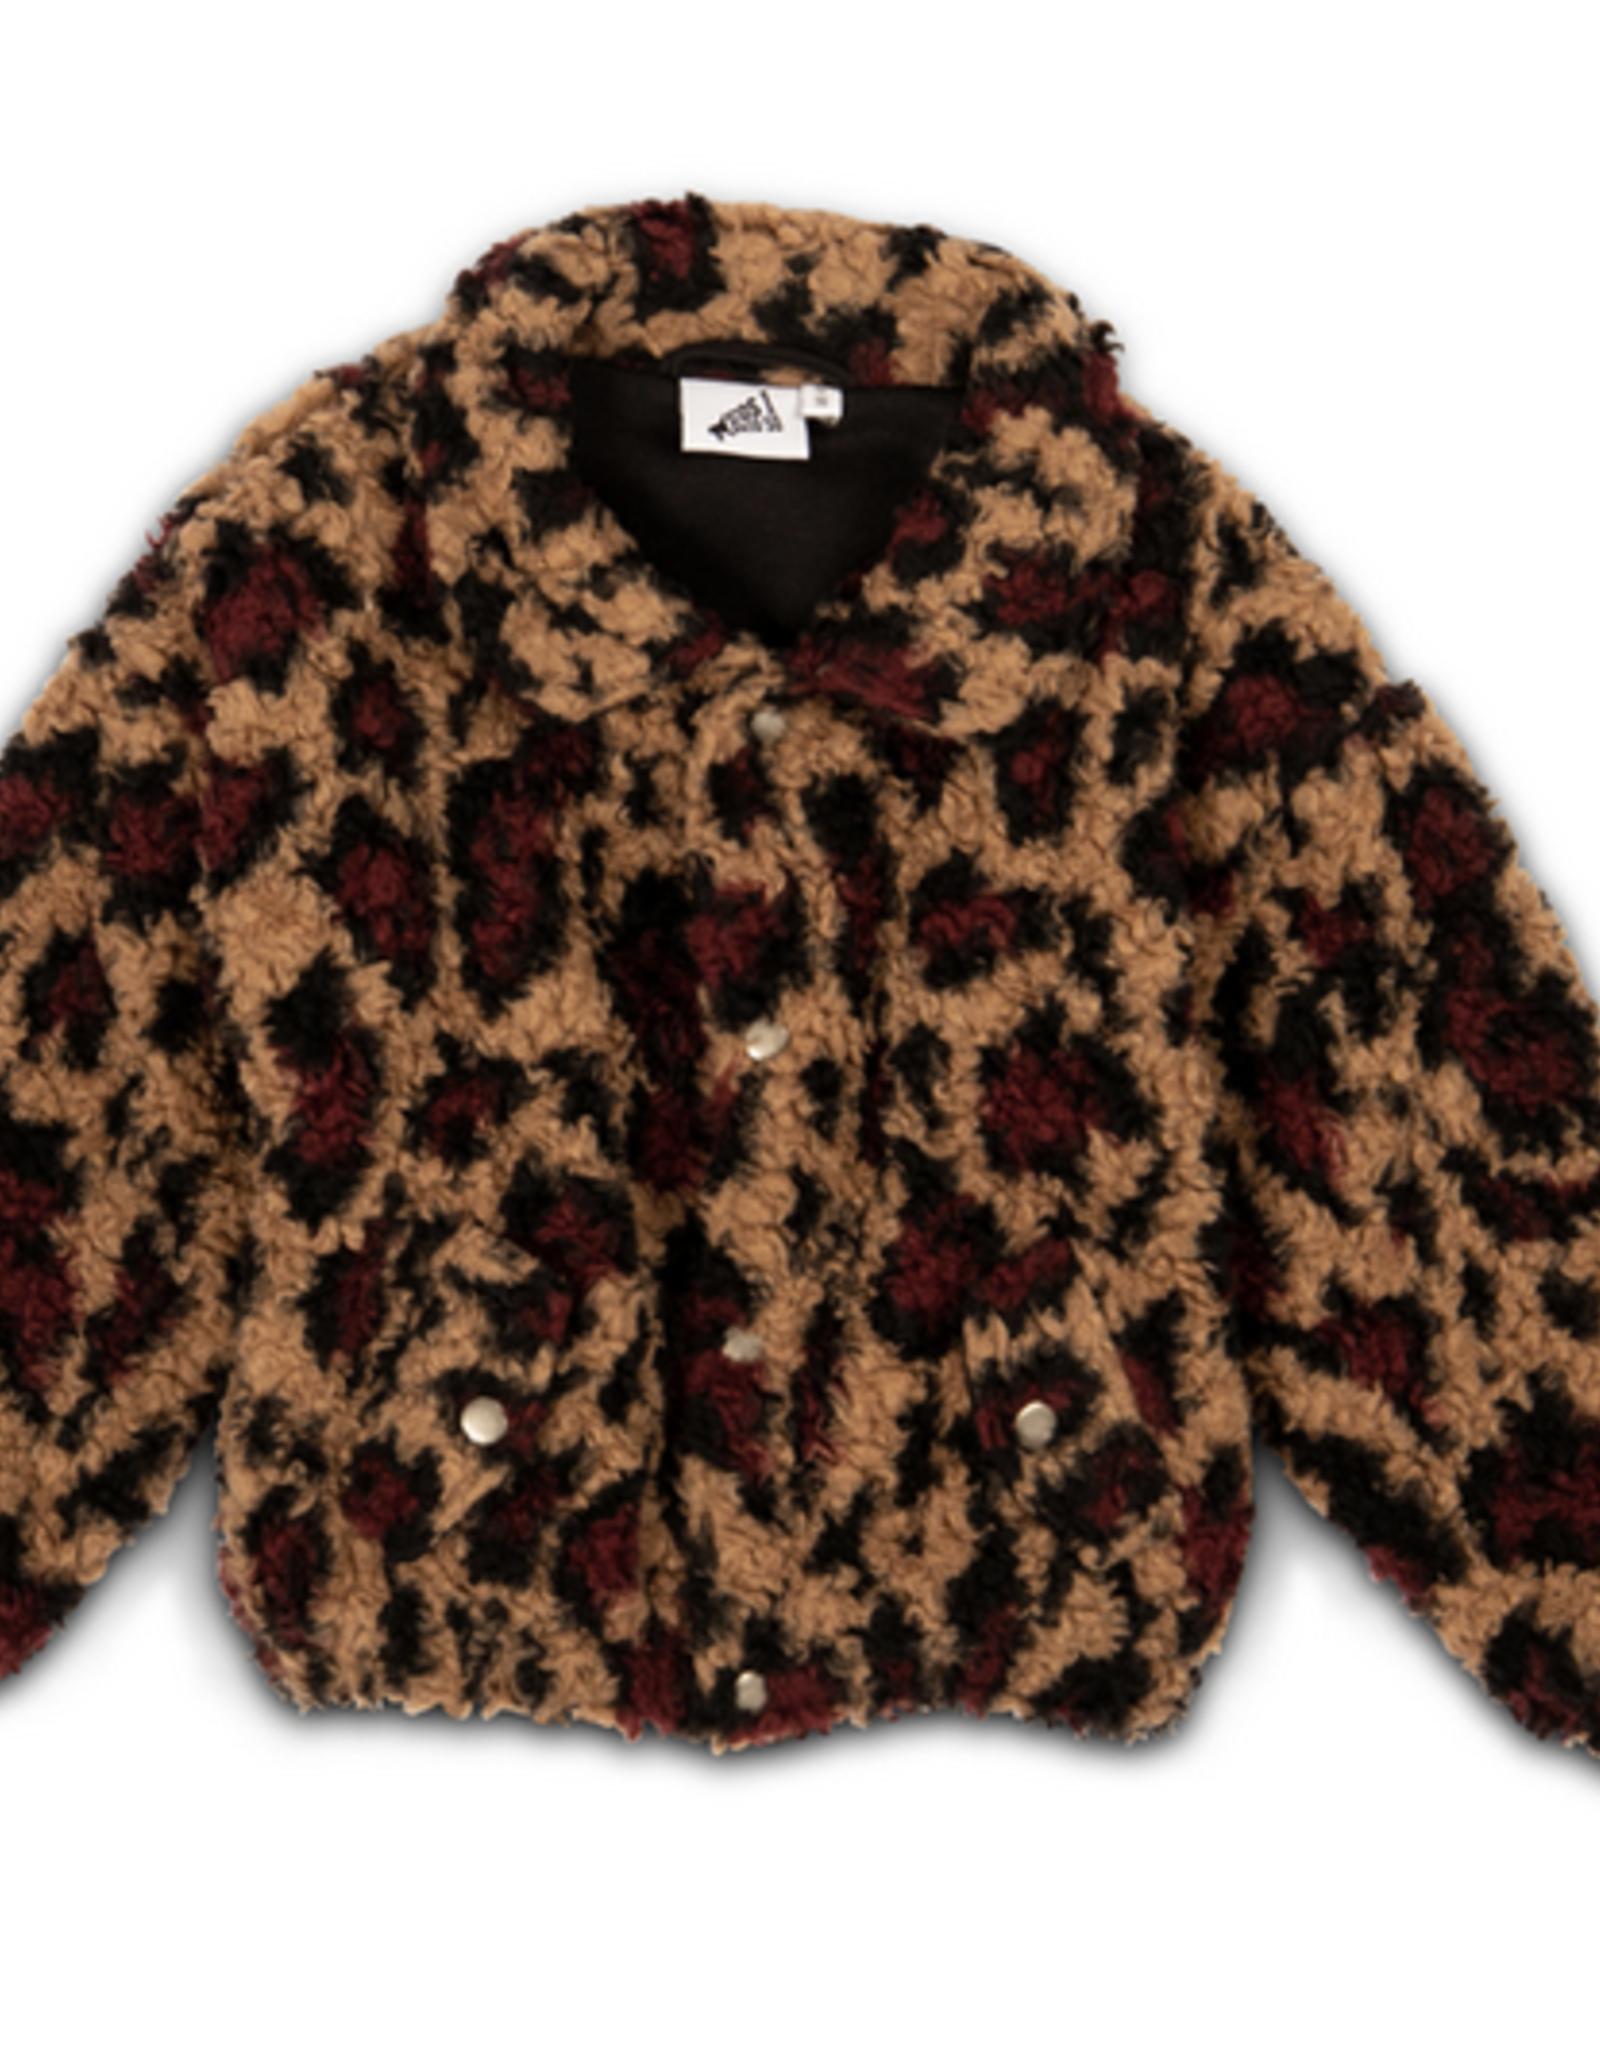 Cos i said so - Bomber jacket - Leopard jacket